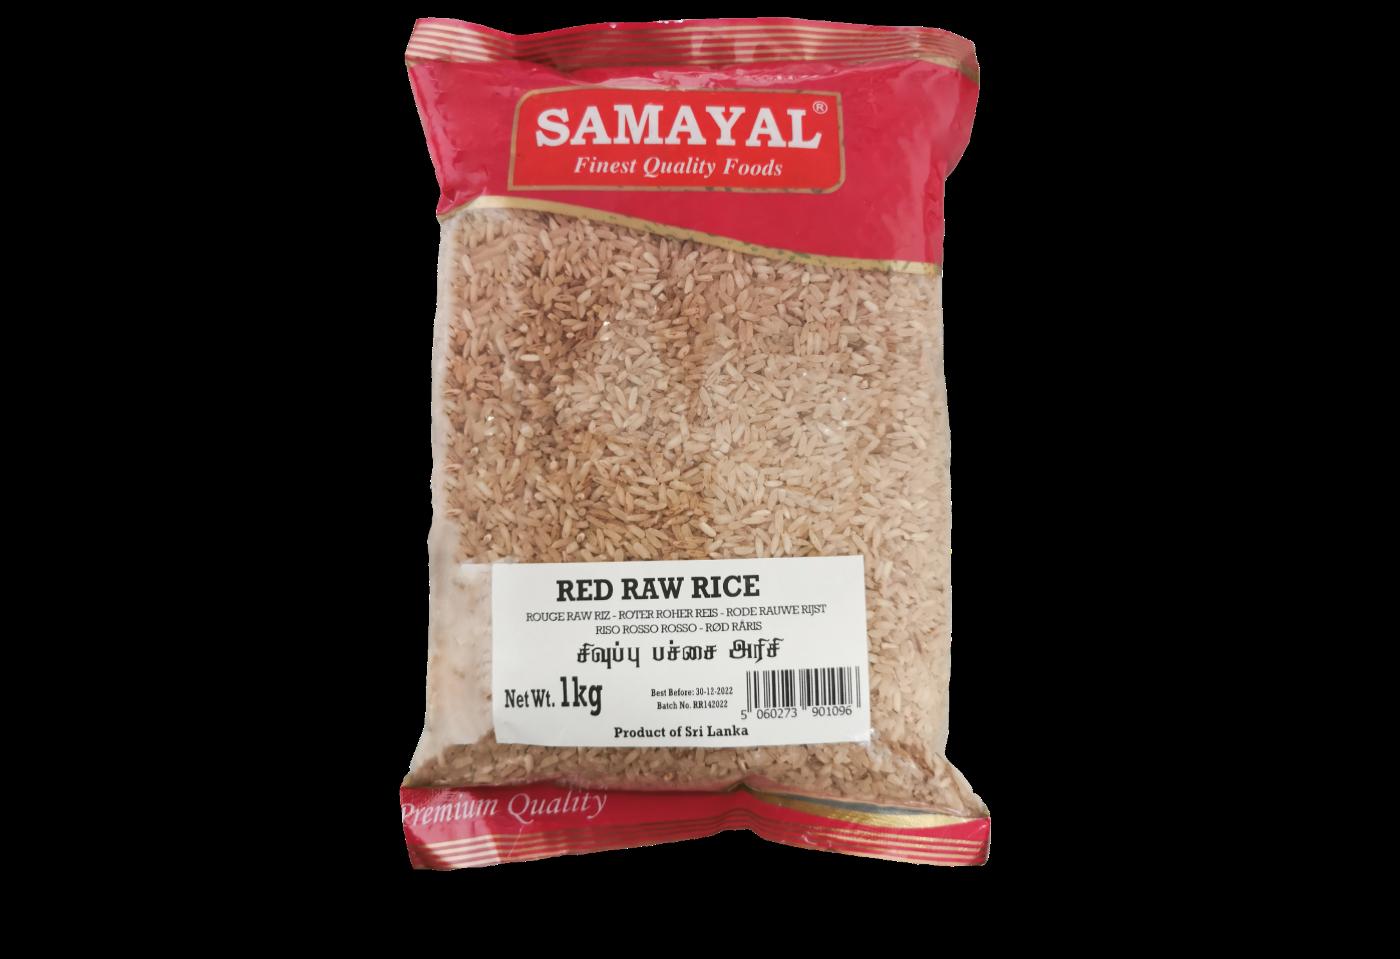 Samayal Red Raw Rice